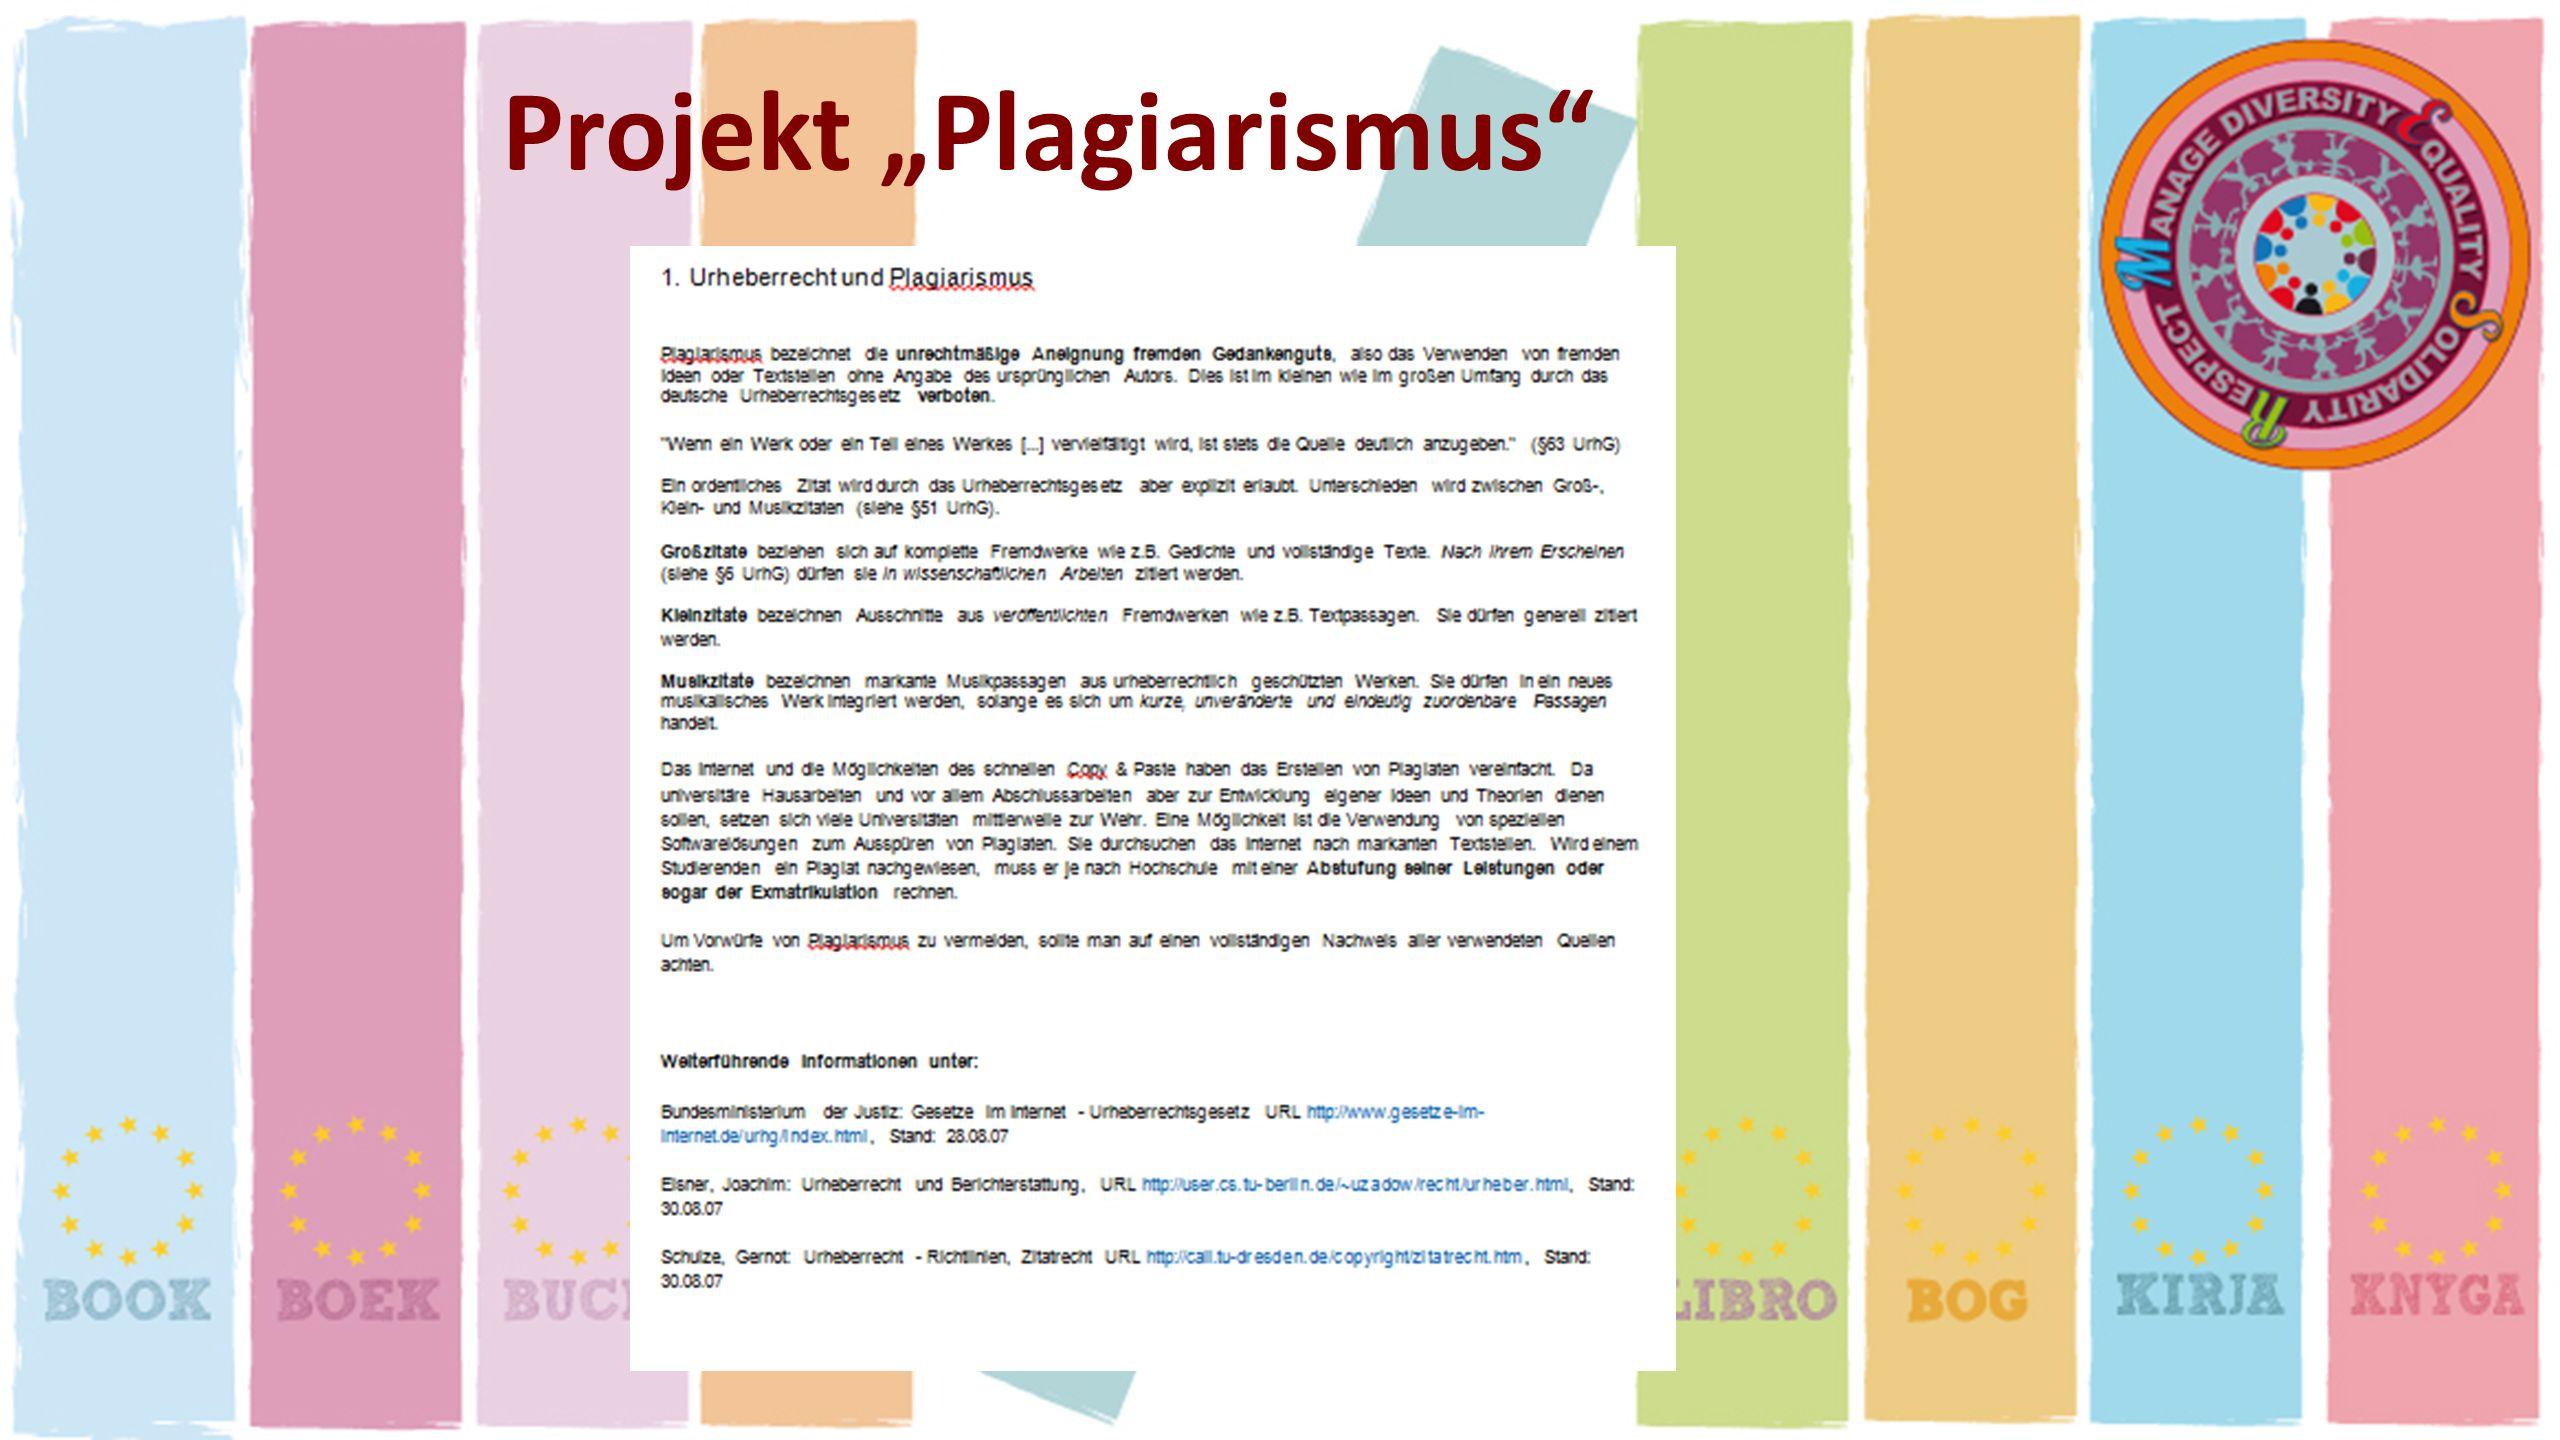 Projekt Plagiarismus